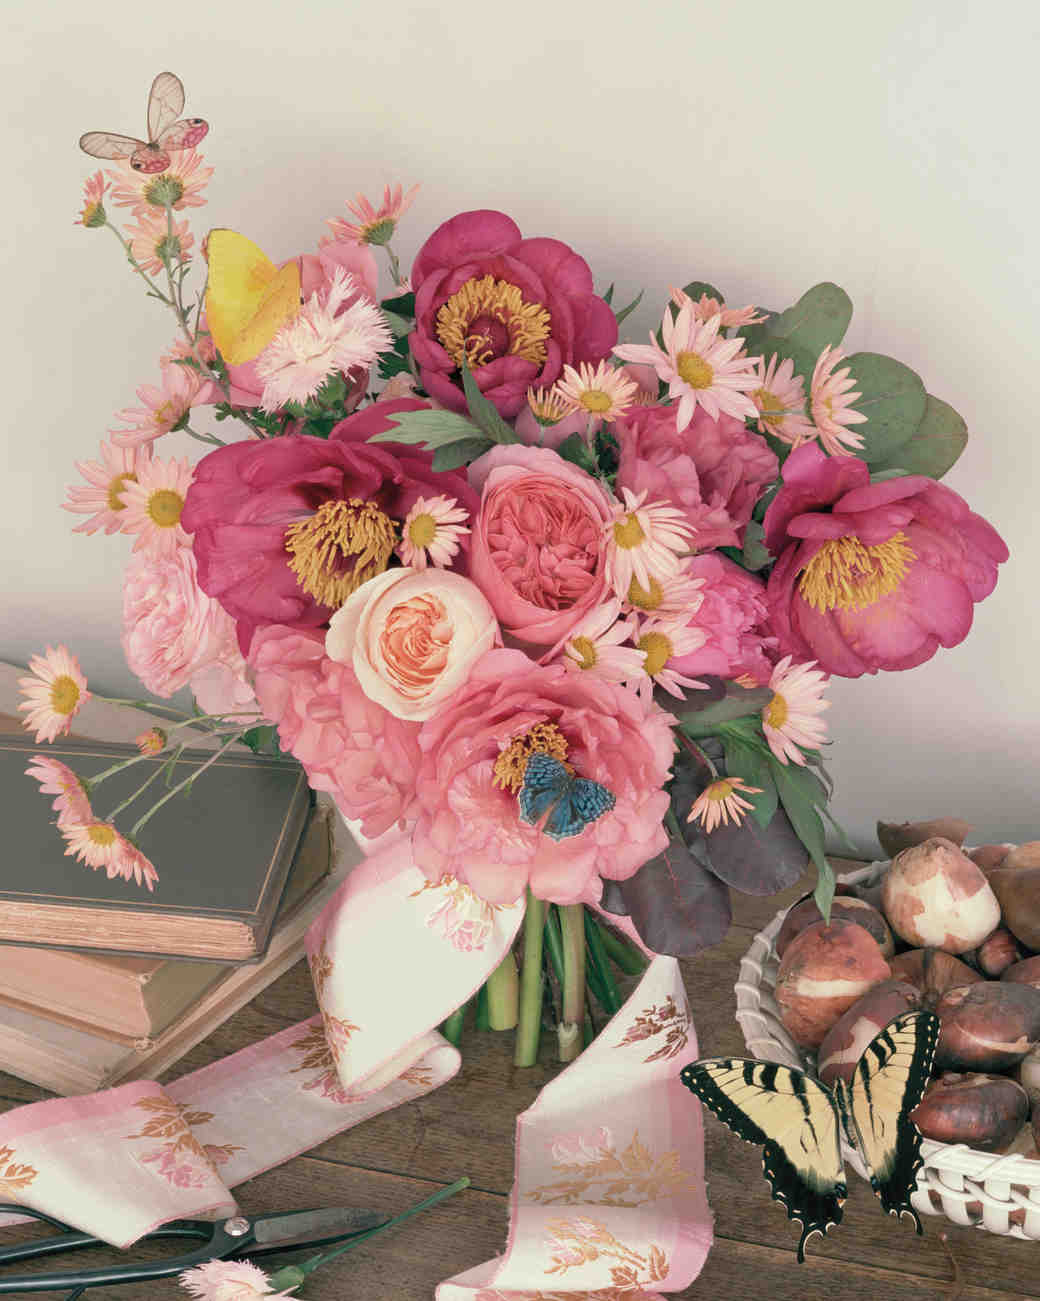 pink-bouquets-mwd108097-0115.jpg